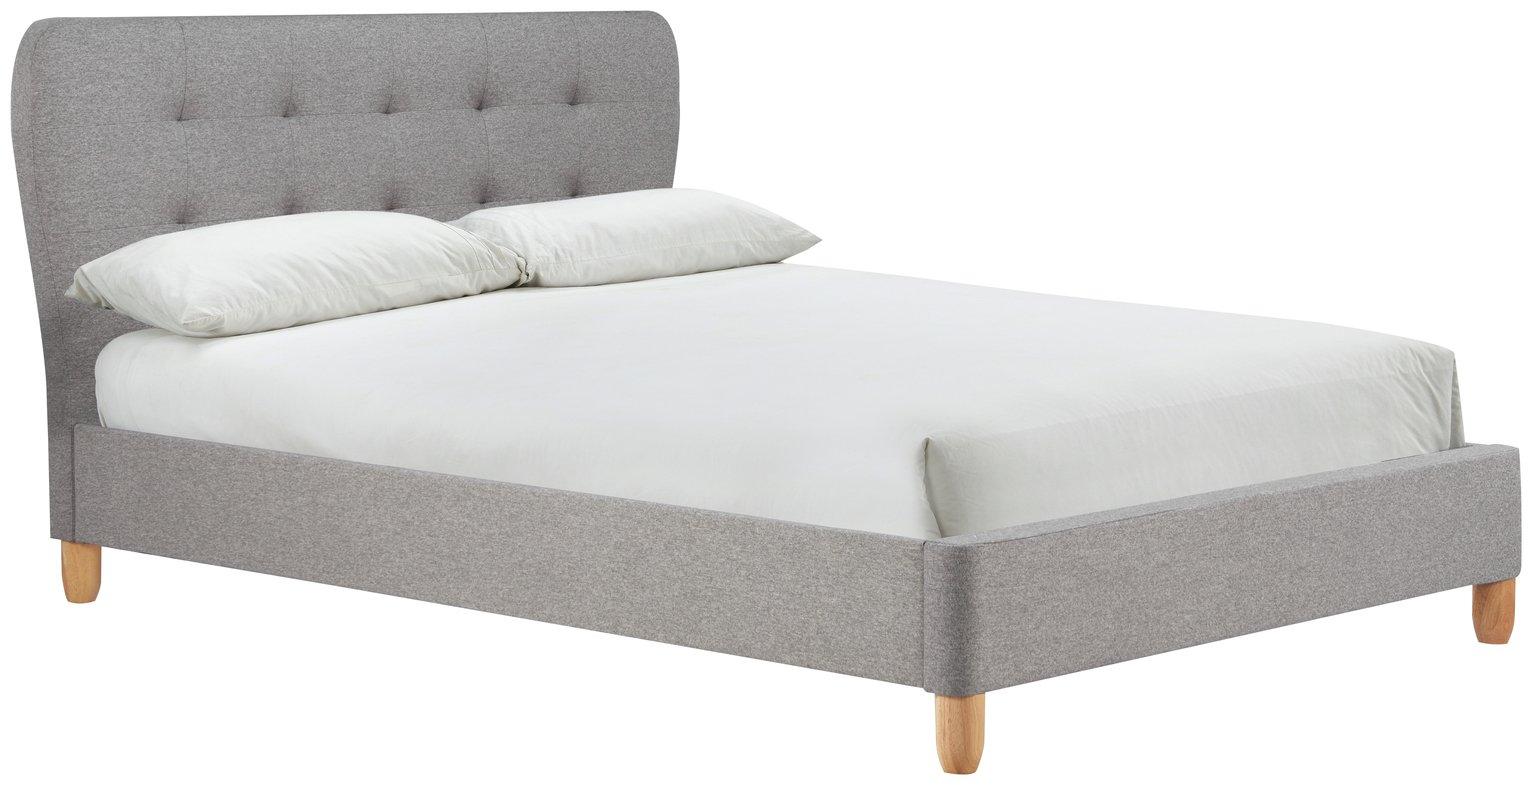 Birlea Stockholm Grey Double Bed Frame